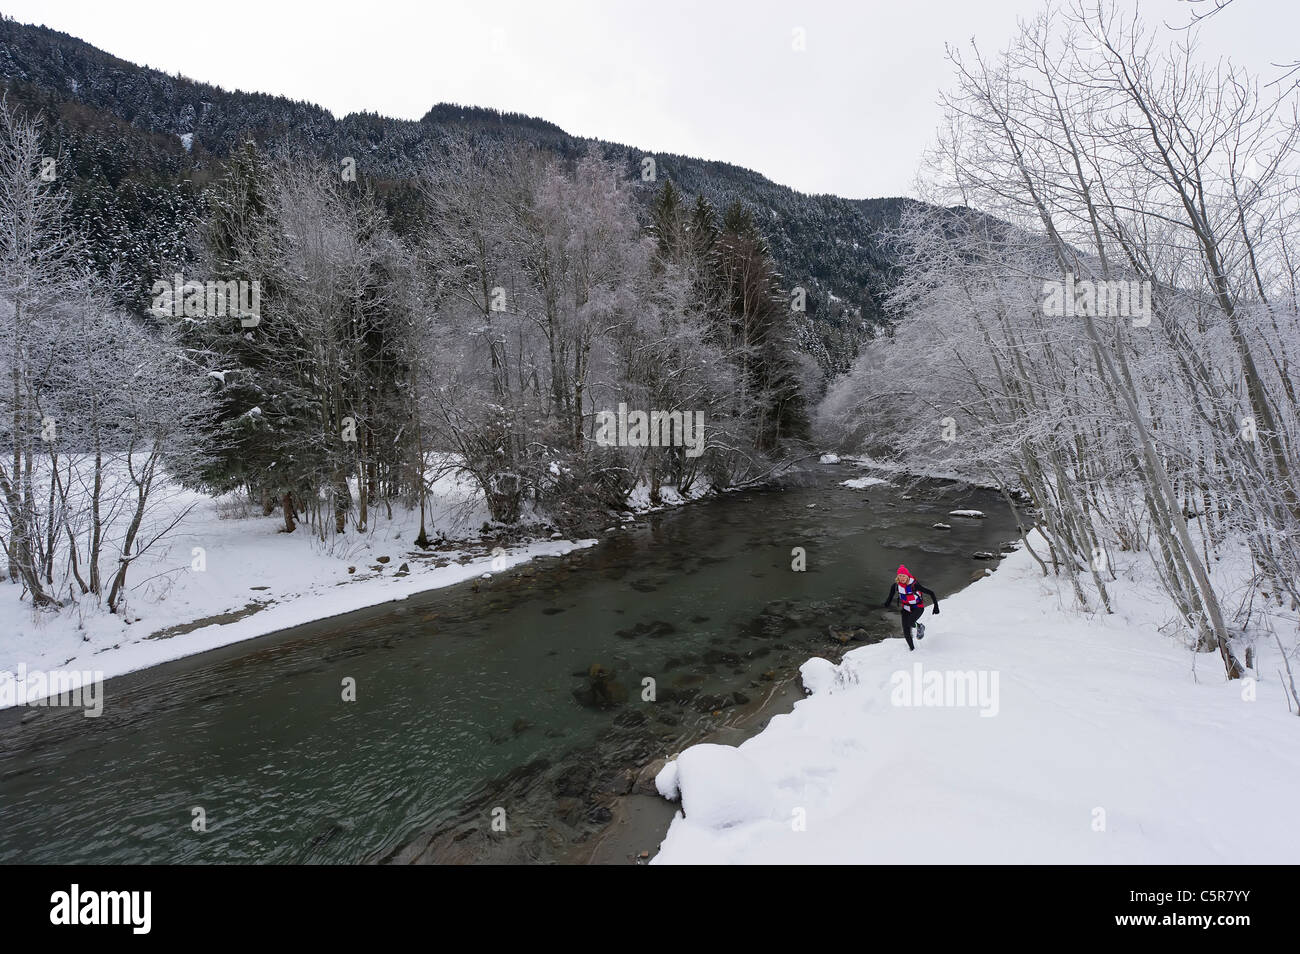 Ein Läufer an einem verschneiten Fluss entlang joggen. Stockbild